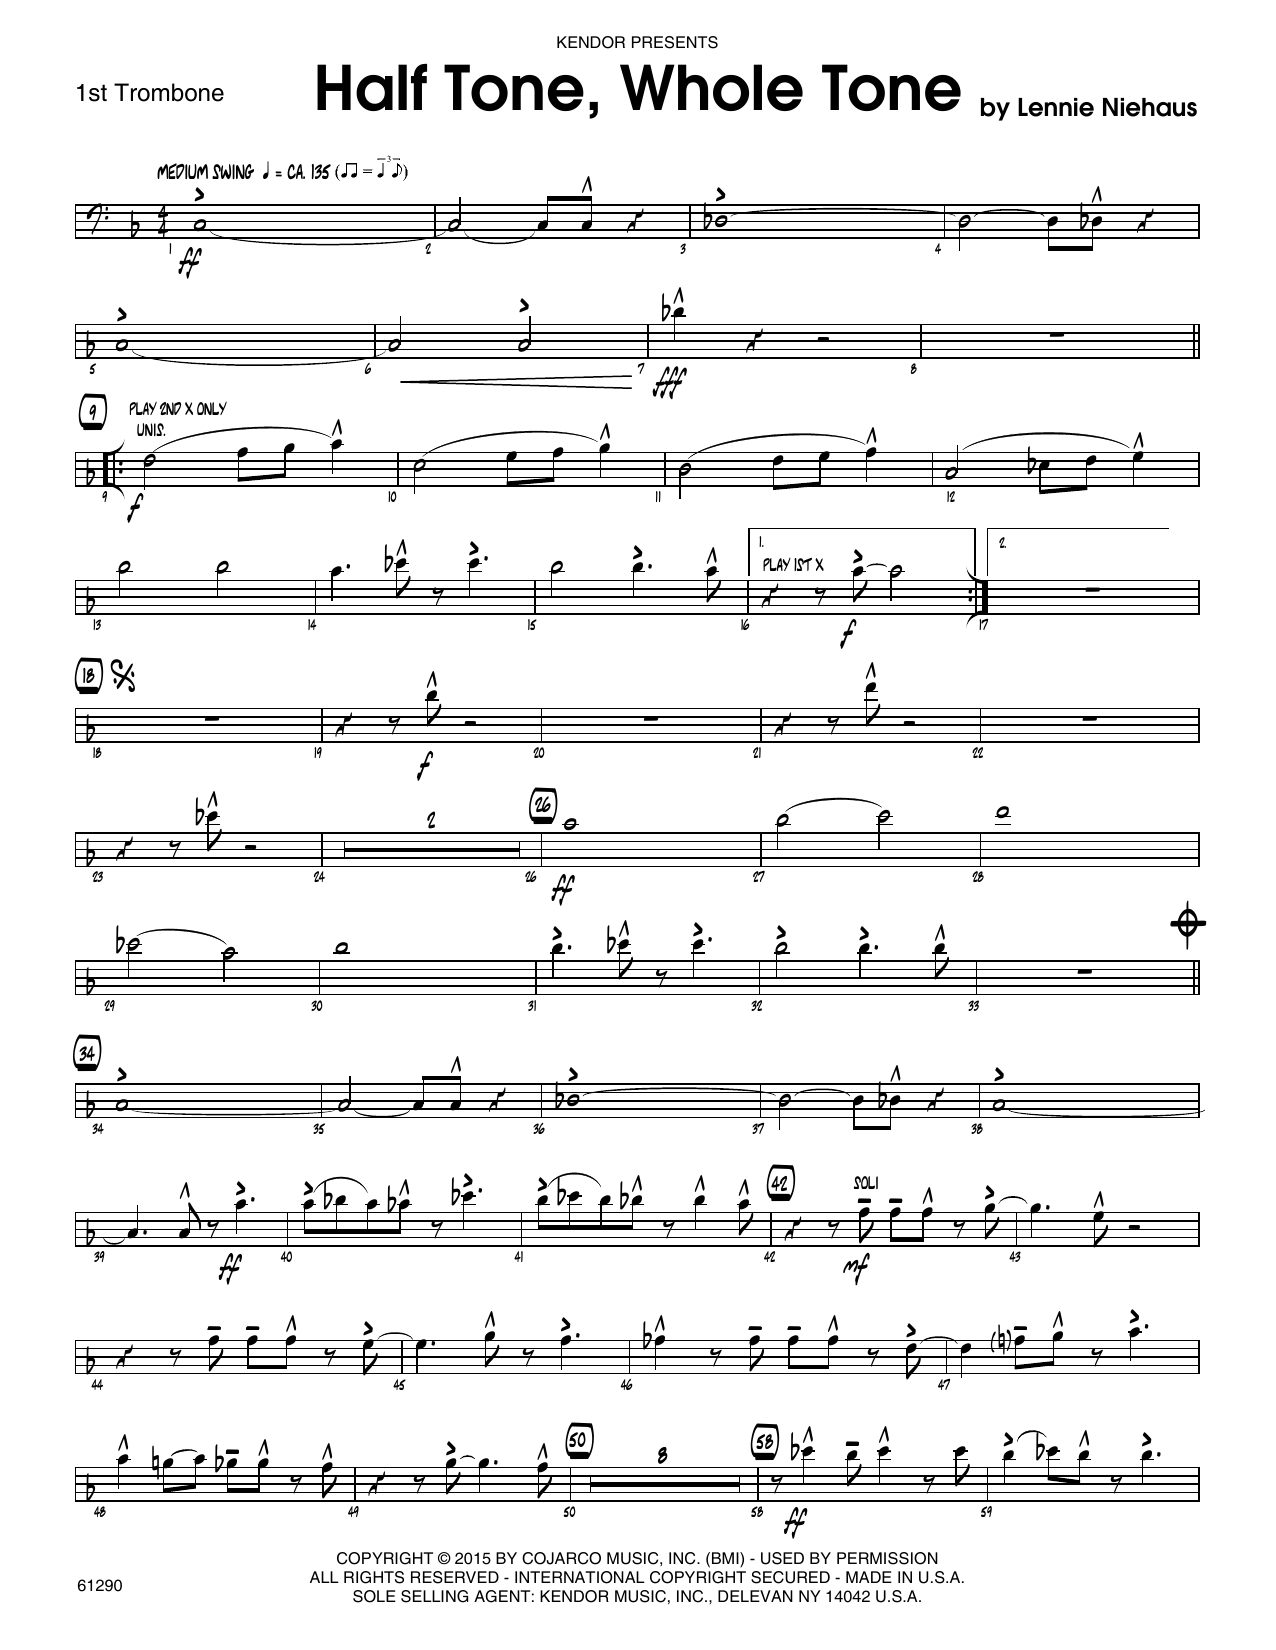 Half Tone, Whole Tone - 1st Trombone Sheet Music